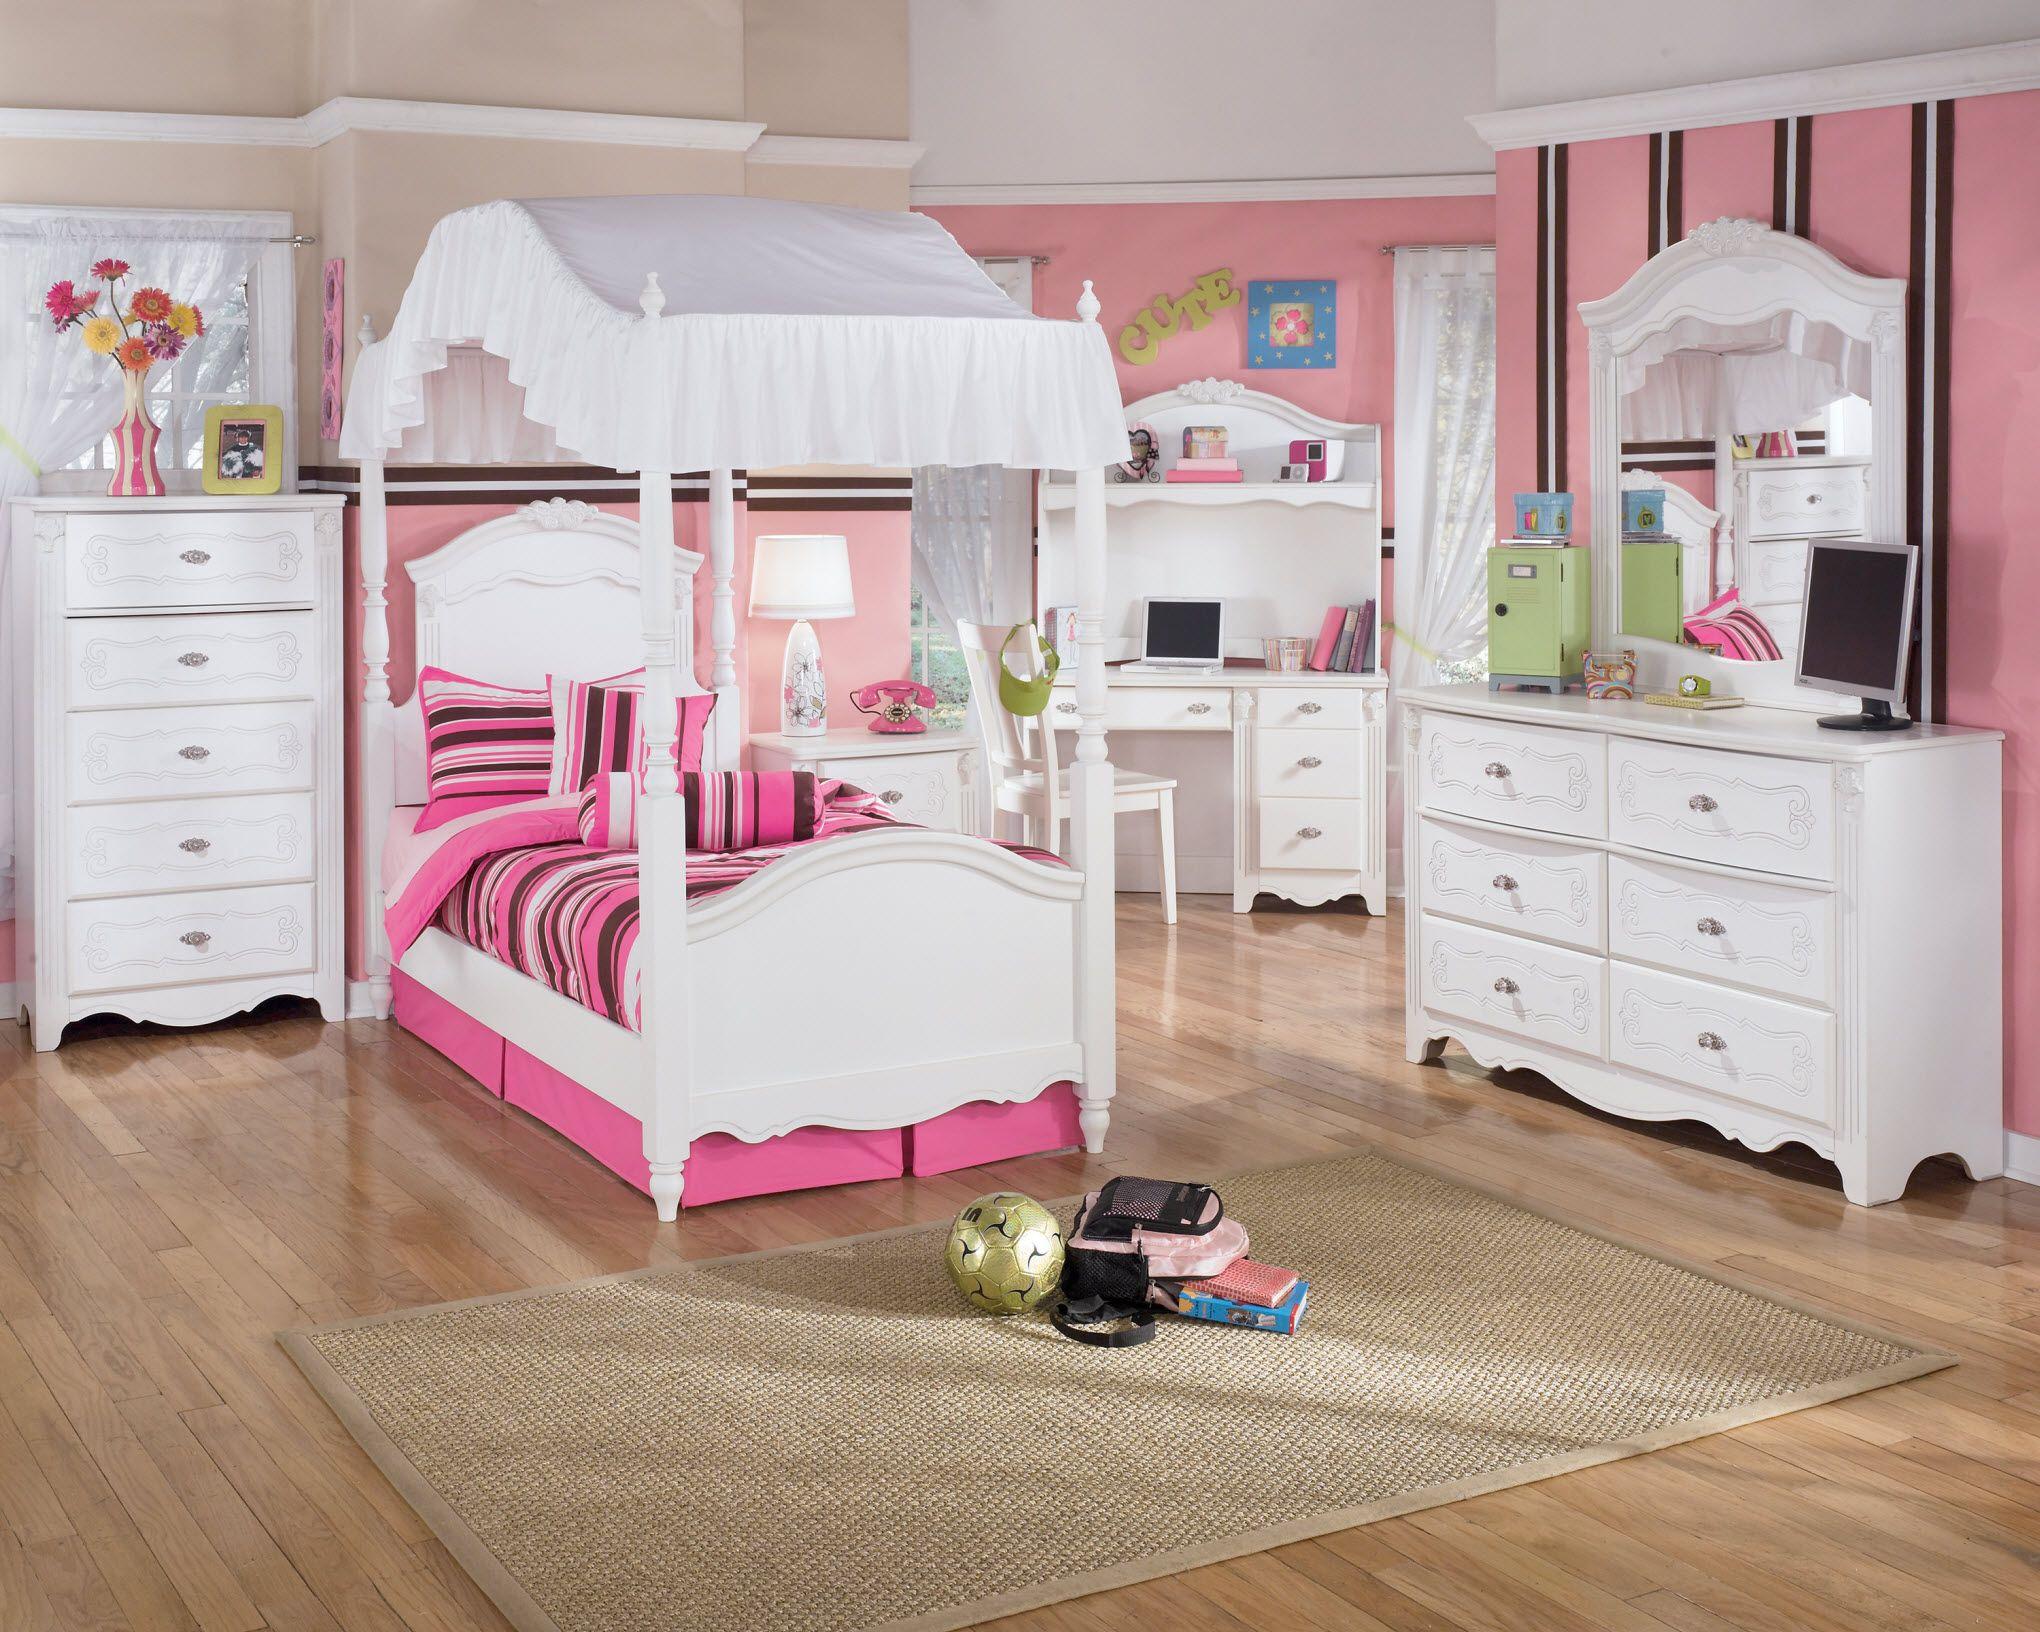 kid bedroom stripe pattern and white bedroom furniture set theme